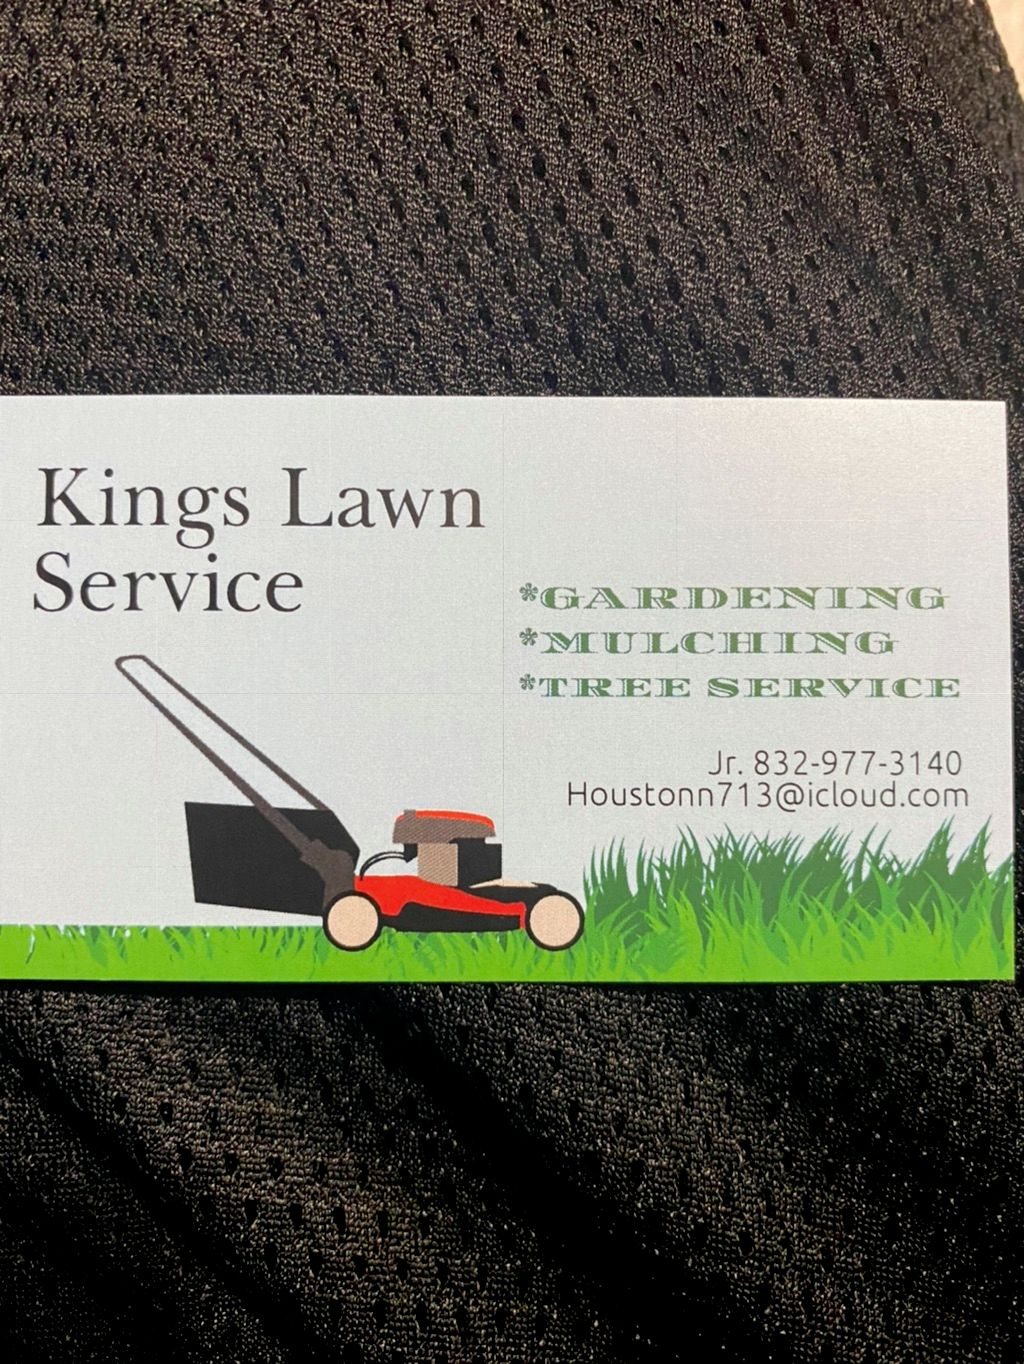 Kings lawn service